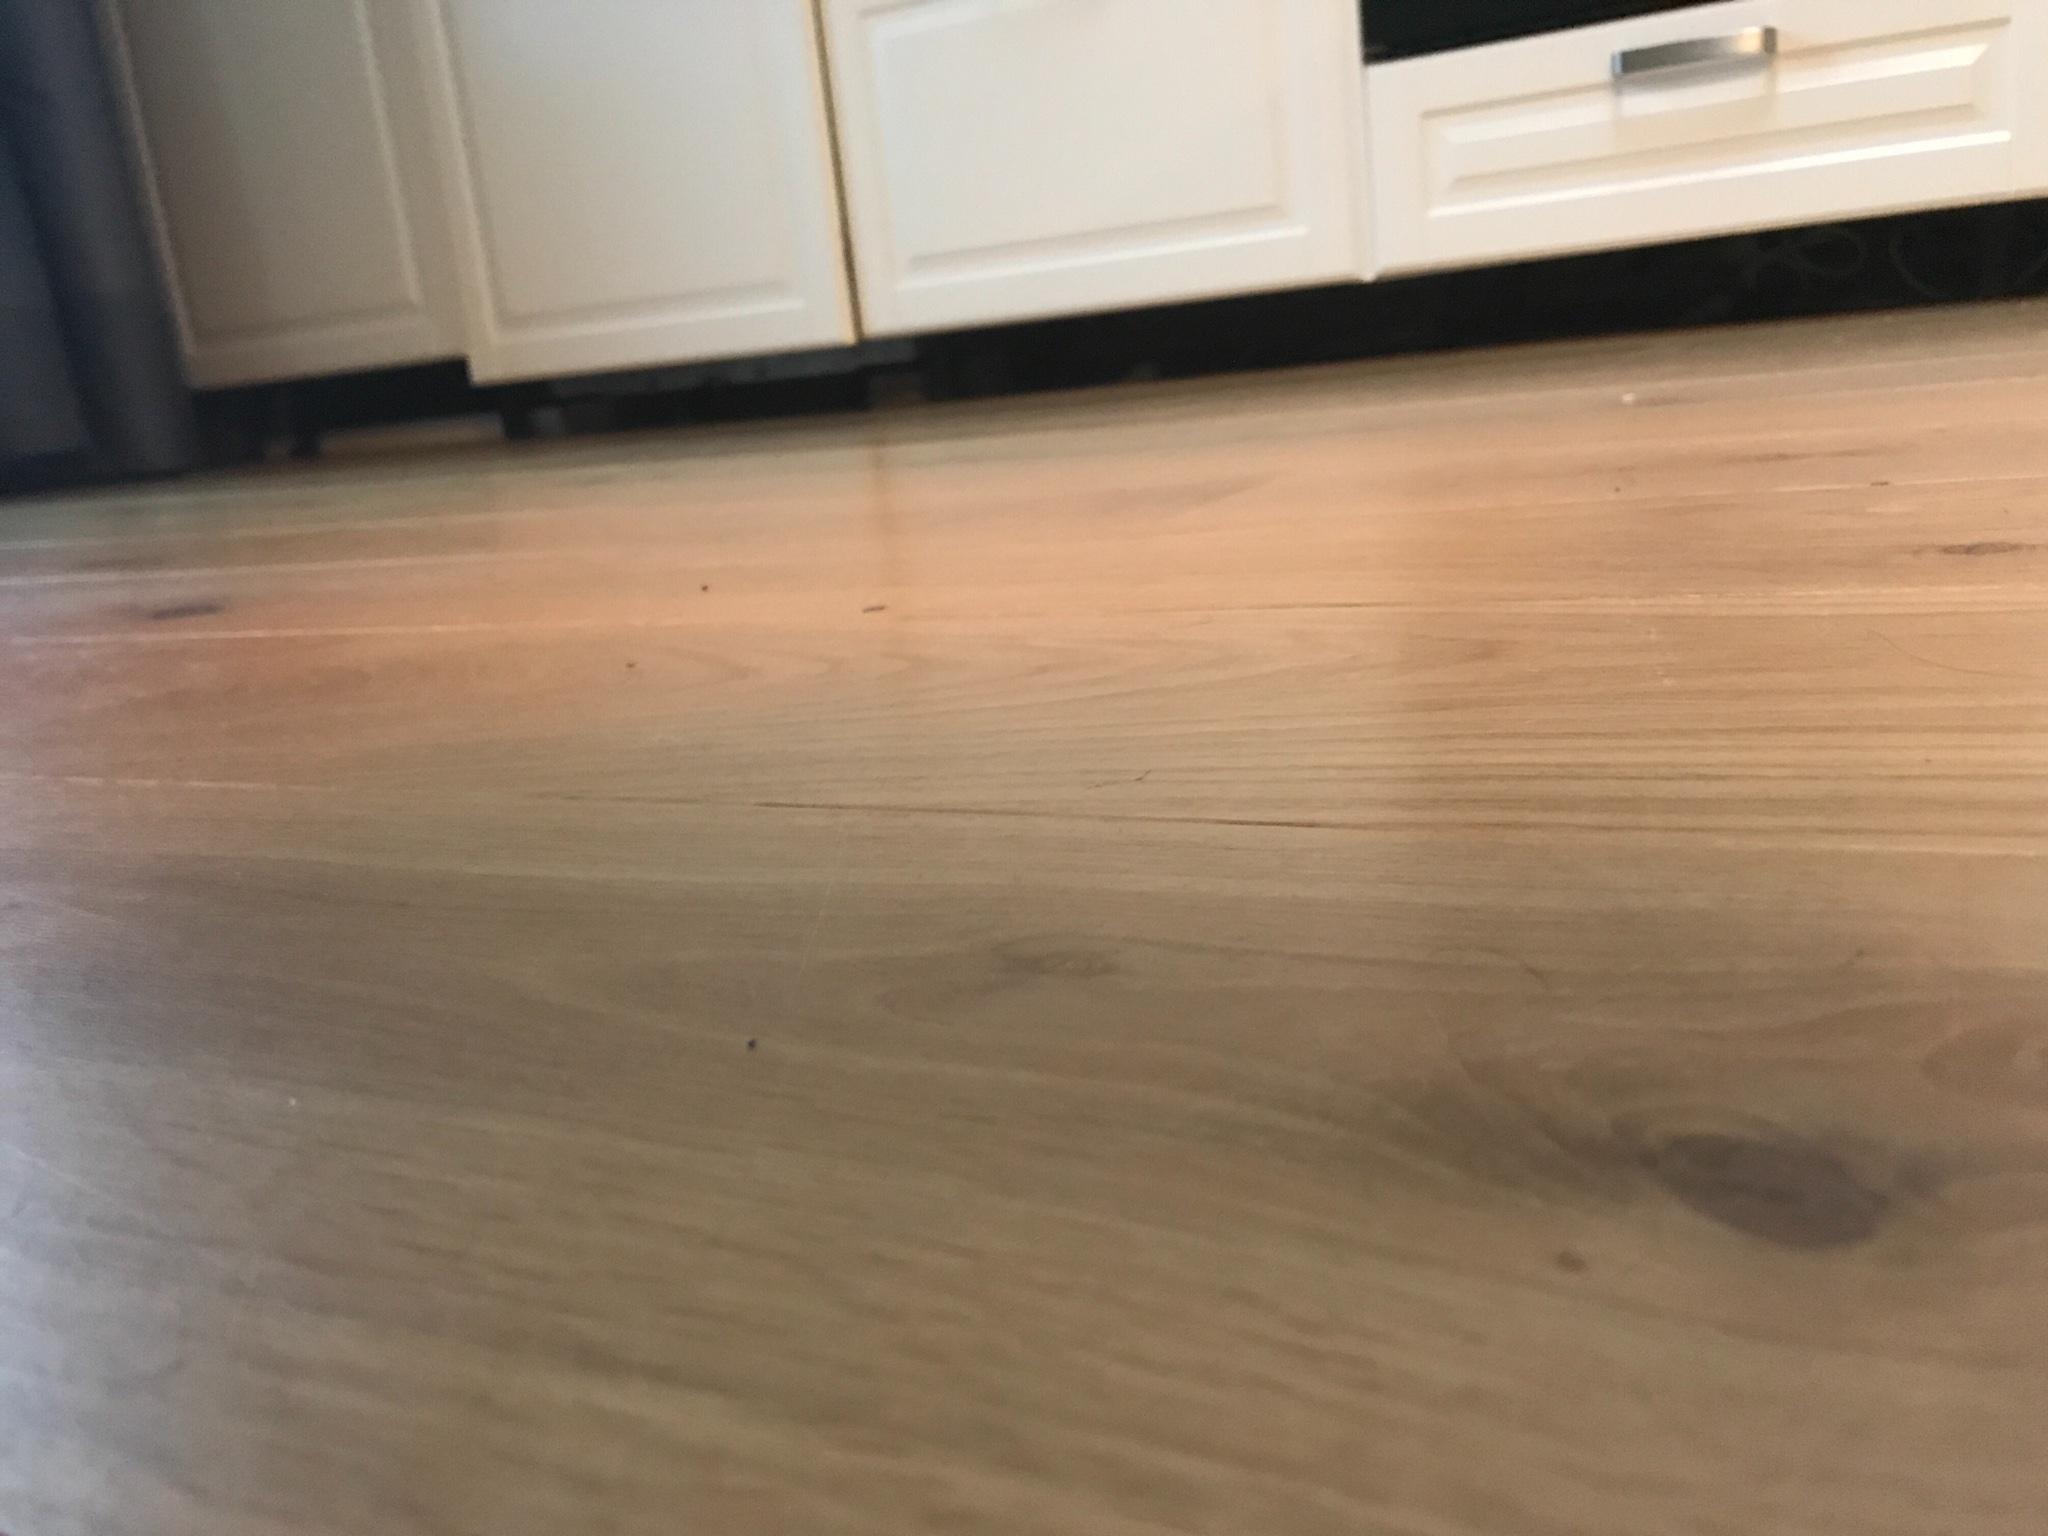 Plint Onder Keuken.Plint Boven En Onder De Keuken Maken Werkspot